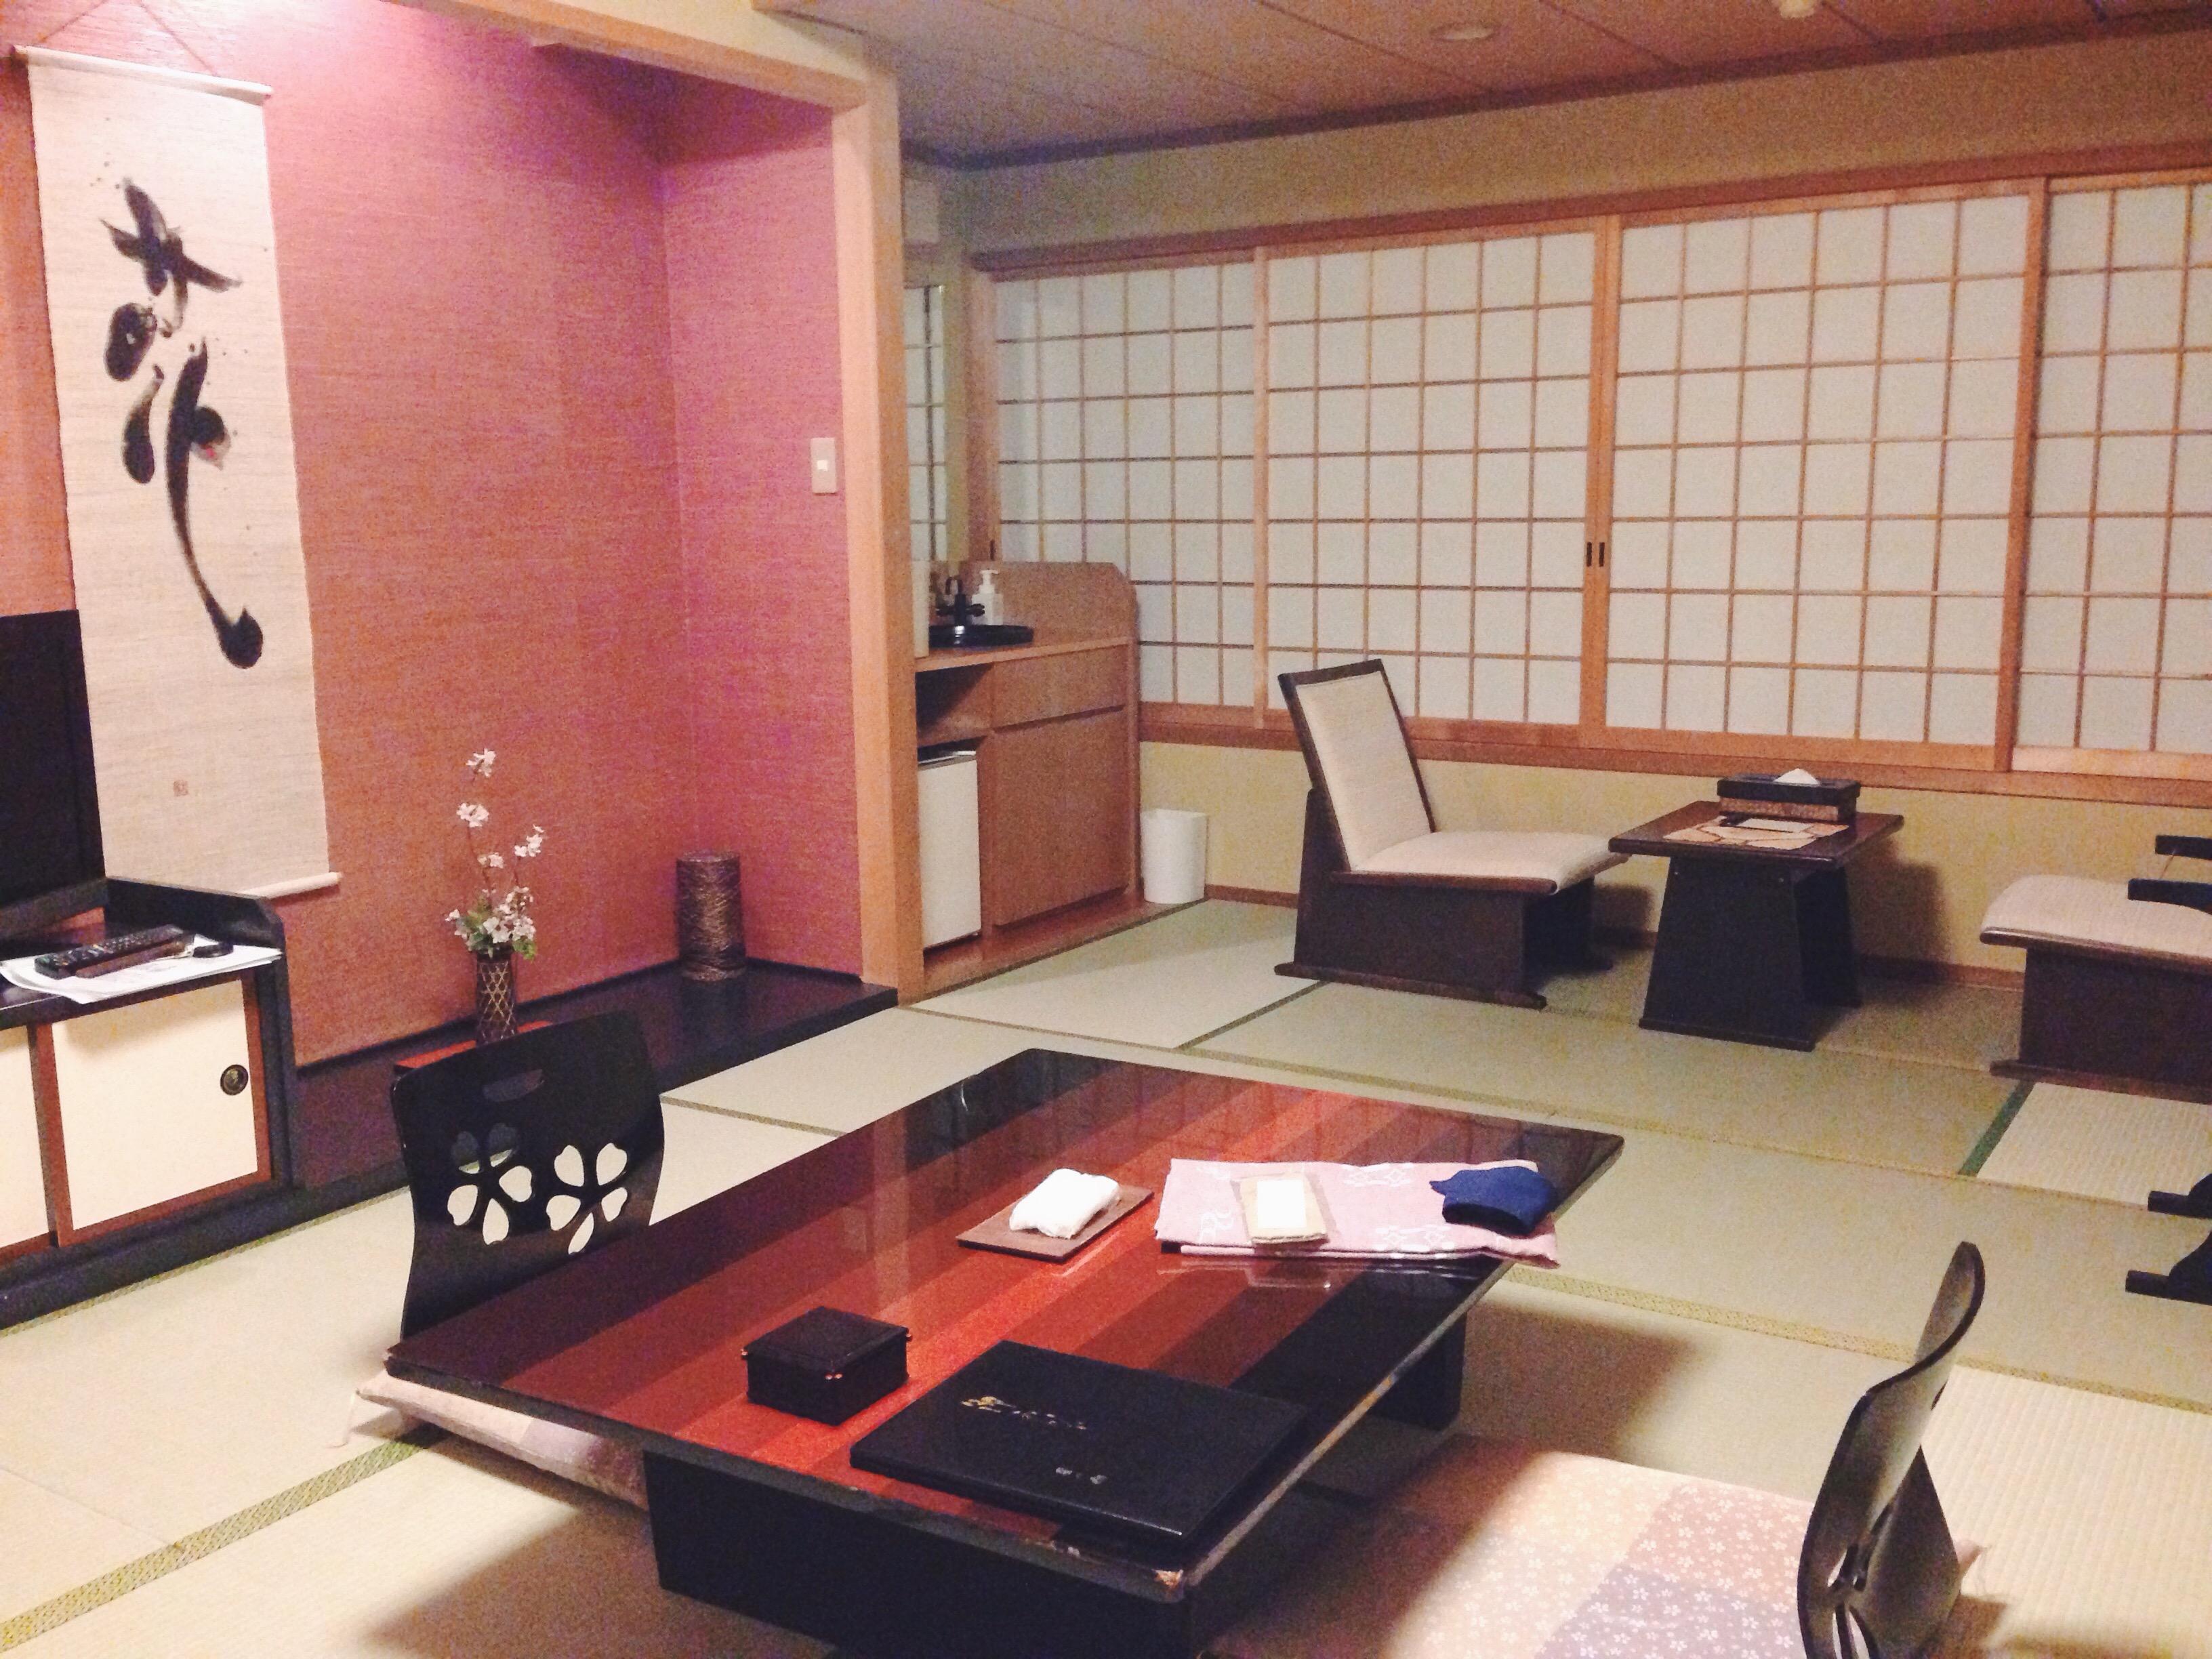 La nostra camerina al ryokan di Nikko